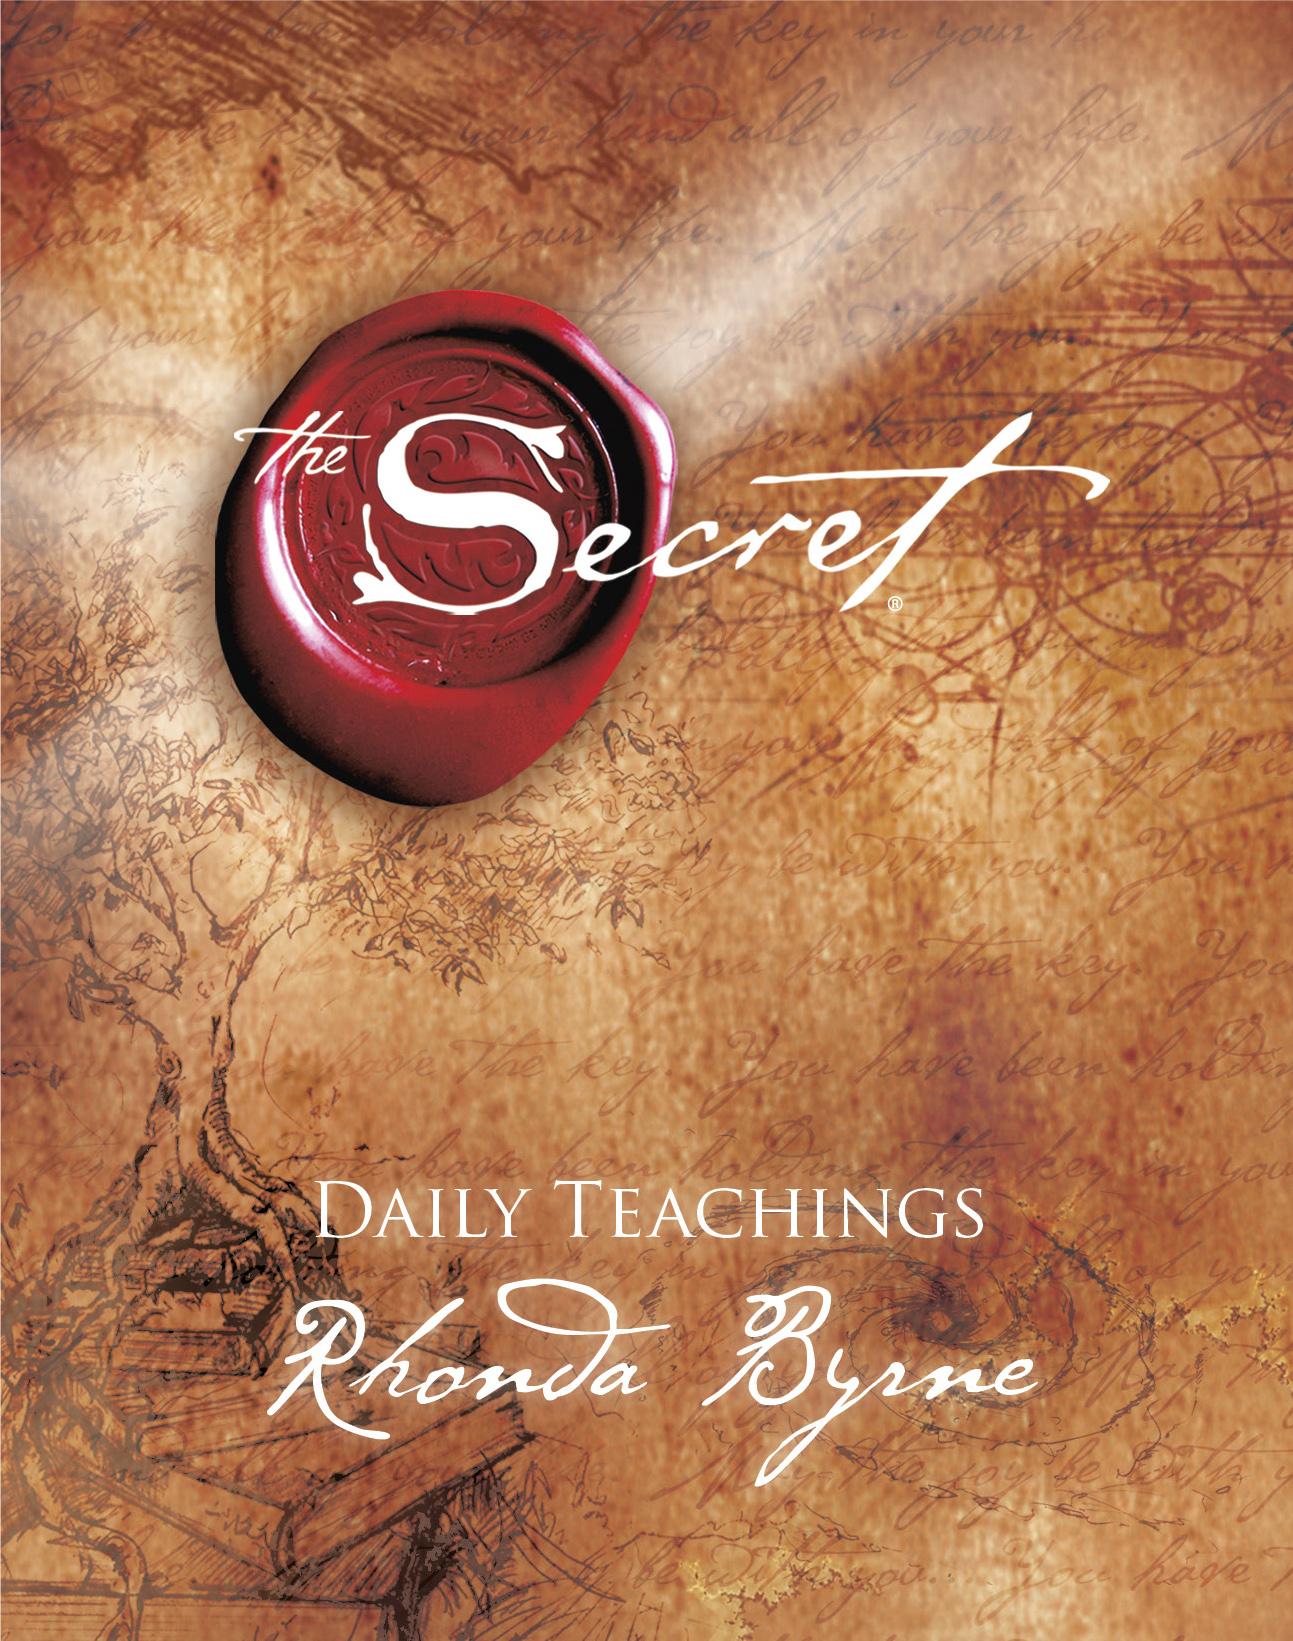 the secret cover.jpeg